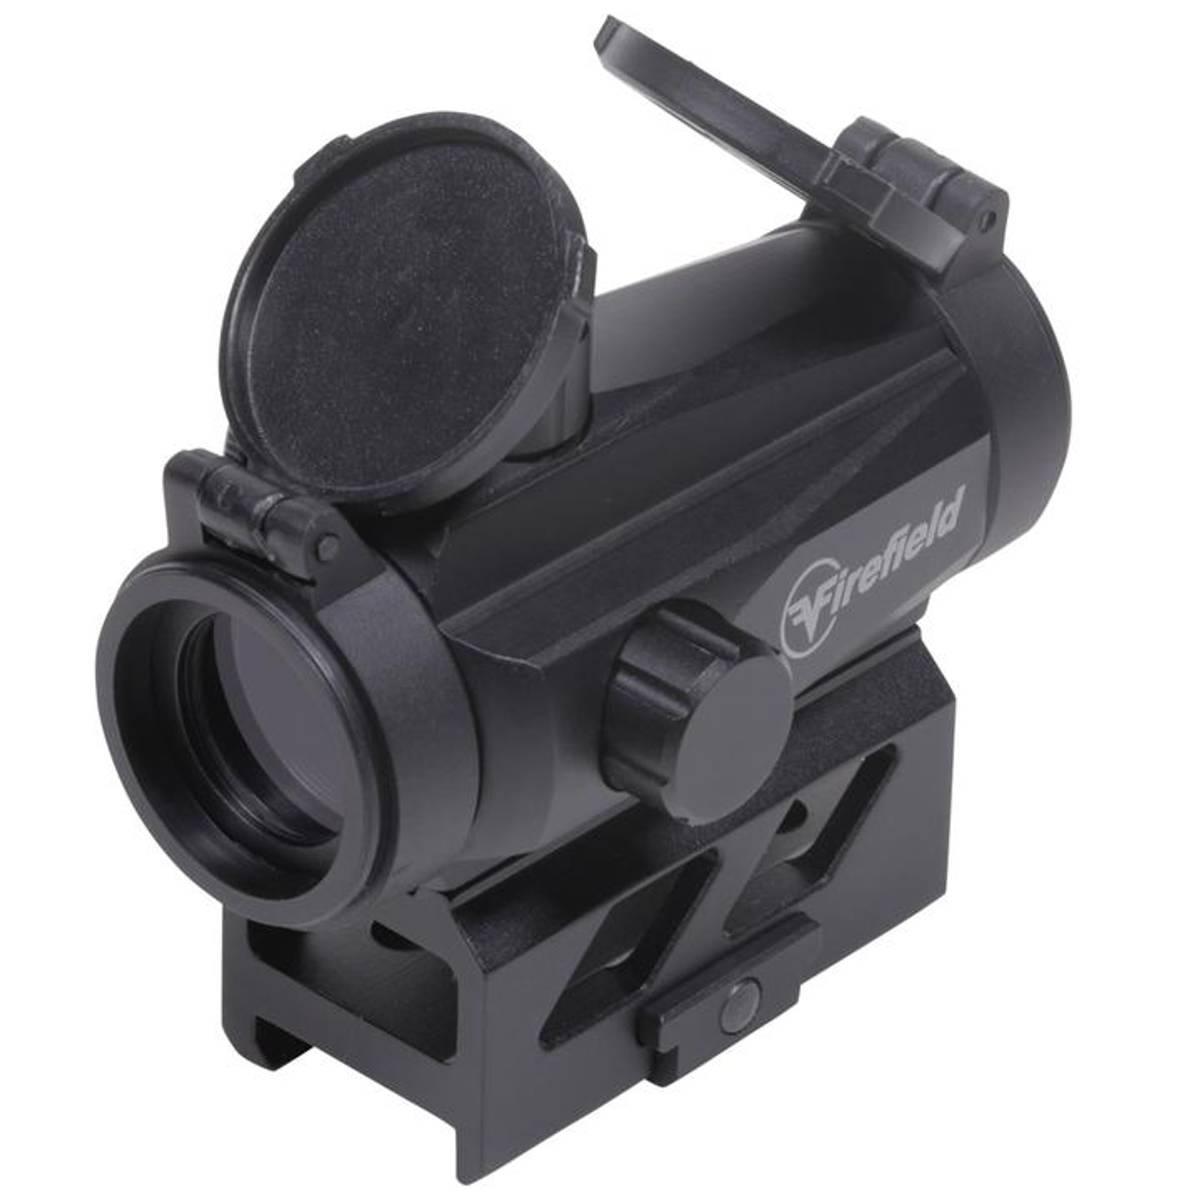 Firefield - Impulse 1x22 Kompakt Rødpunktsikte - 21mm